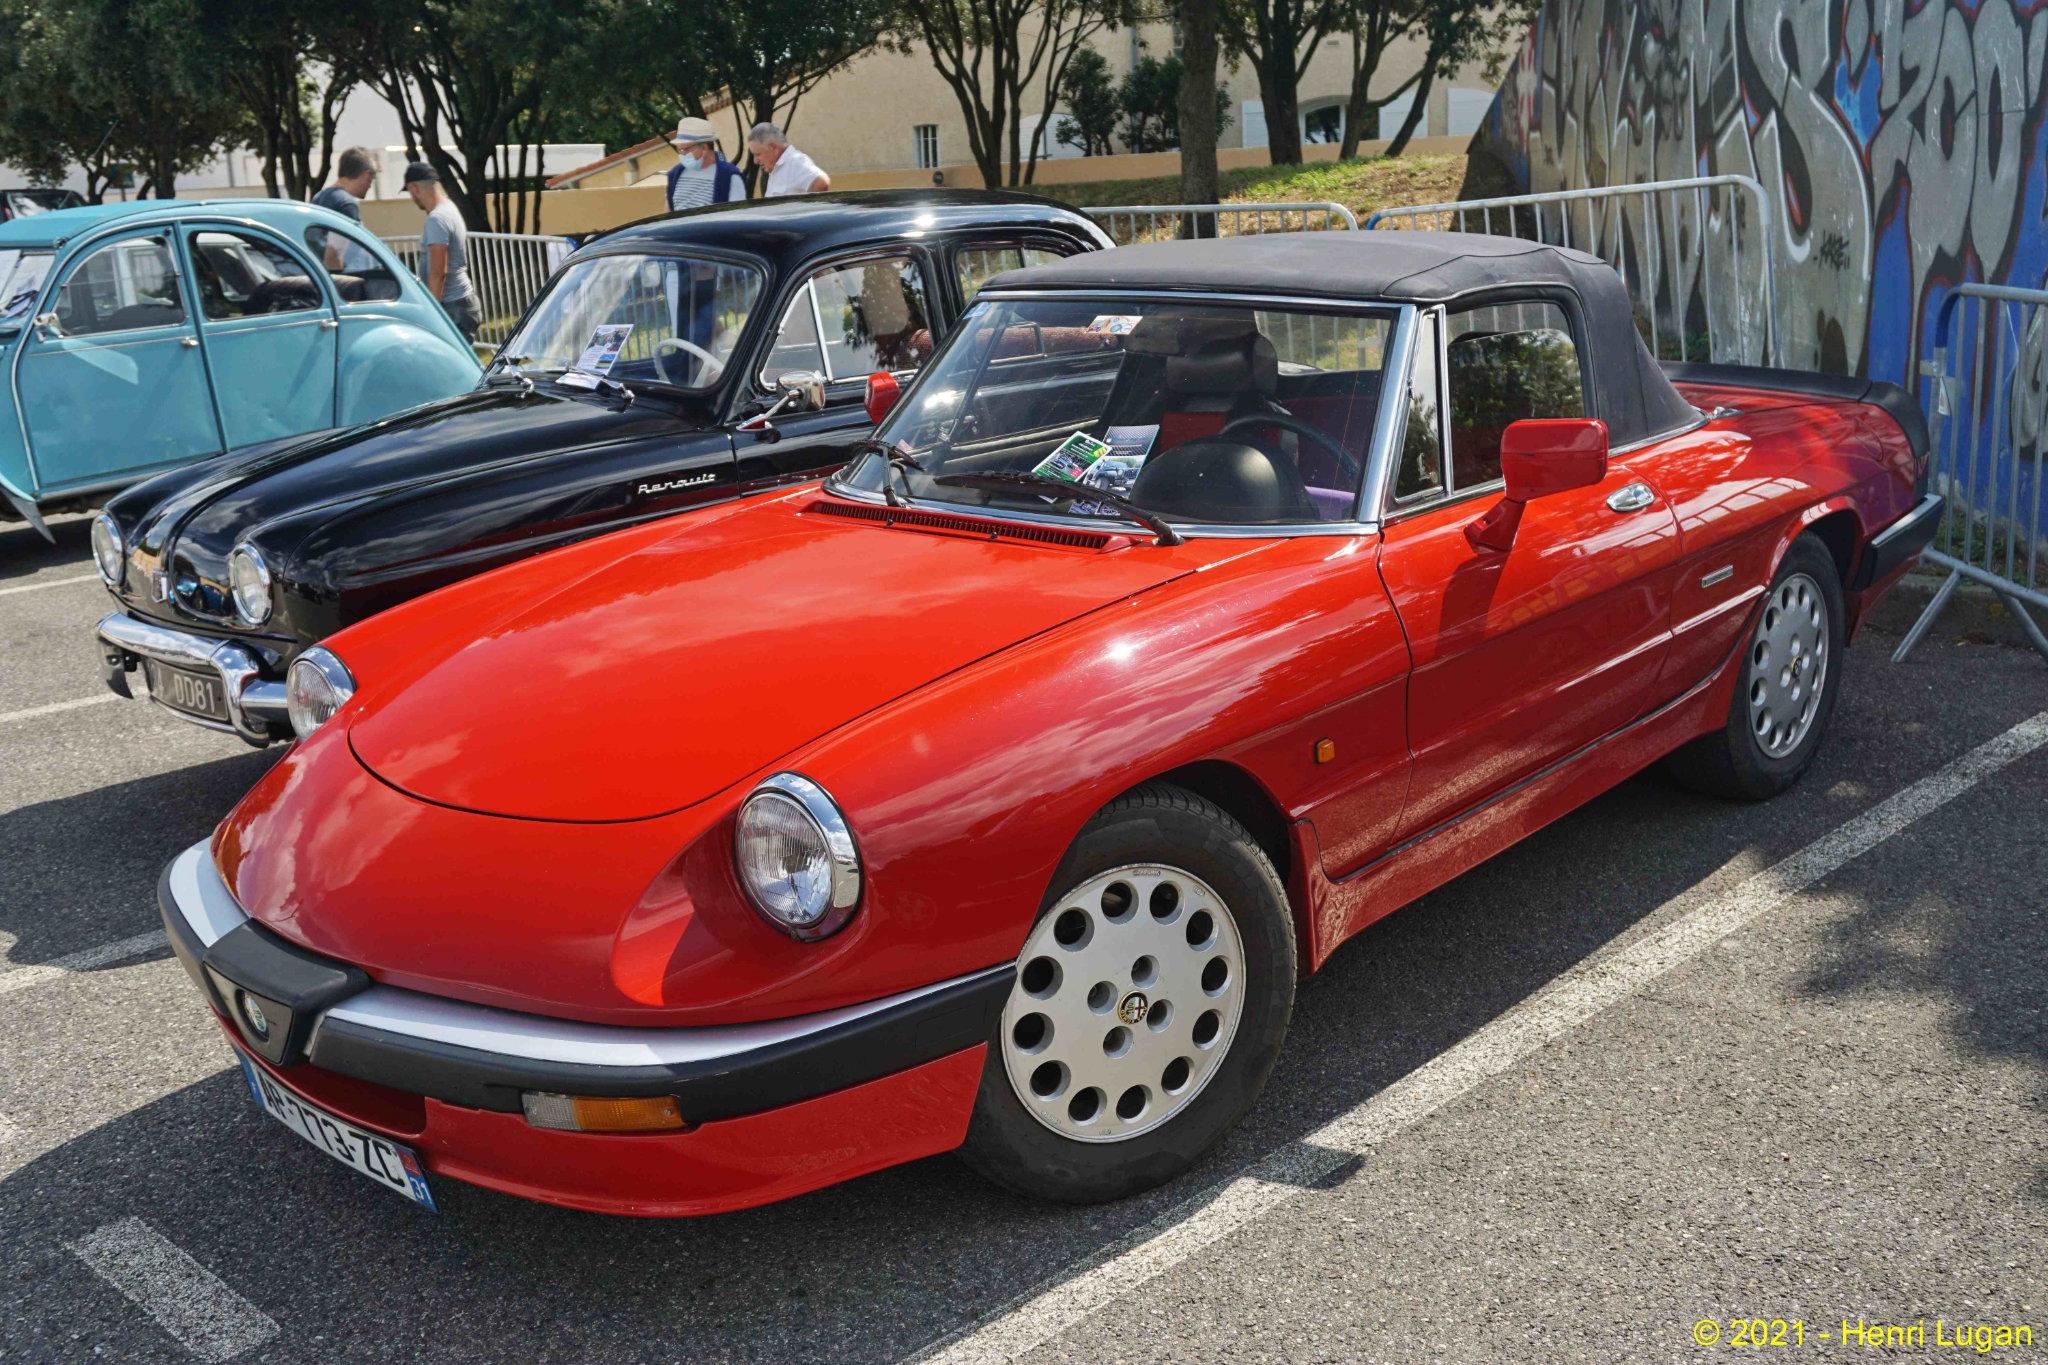 Alfa Romeo duetto 1300_08- 1977 [I] HL_GF